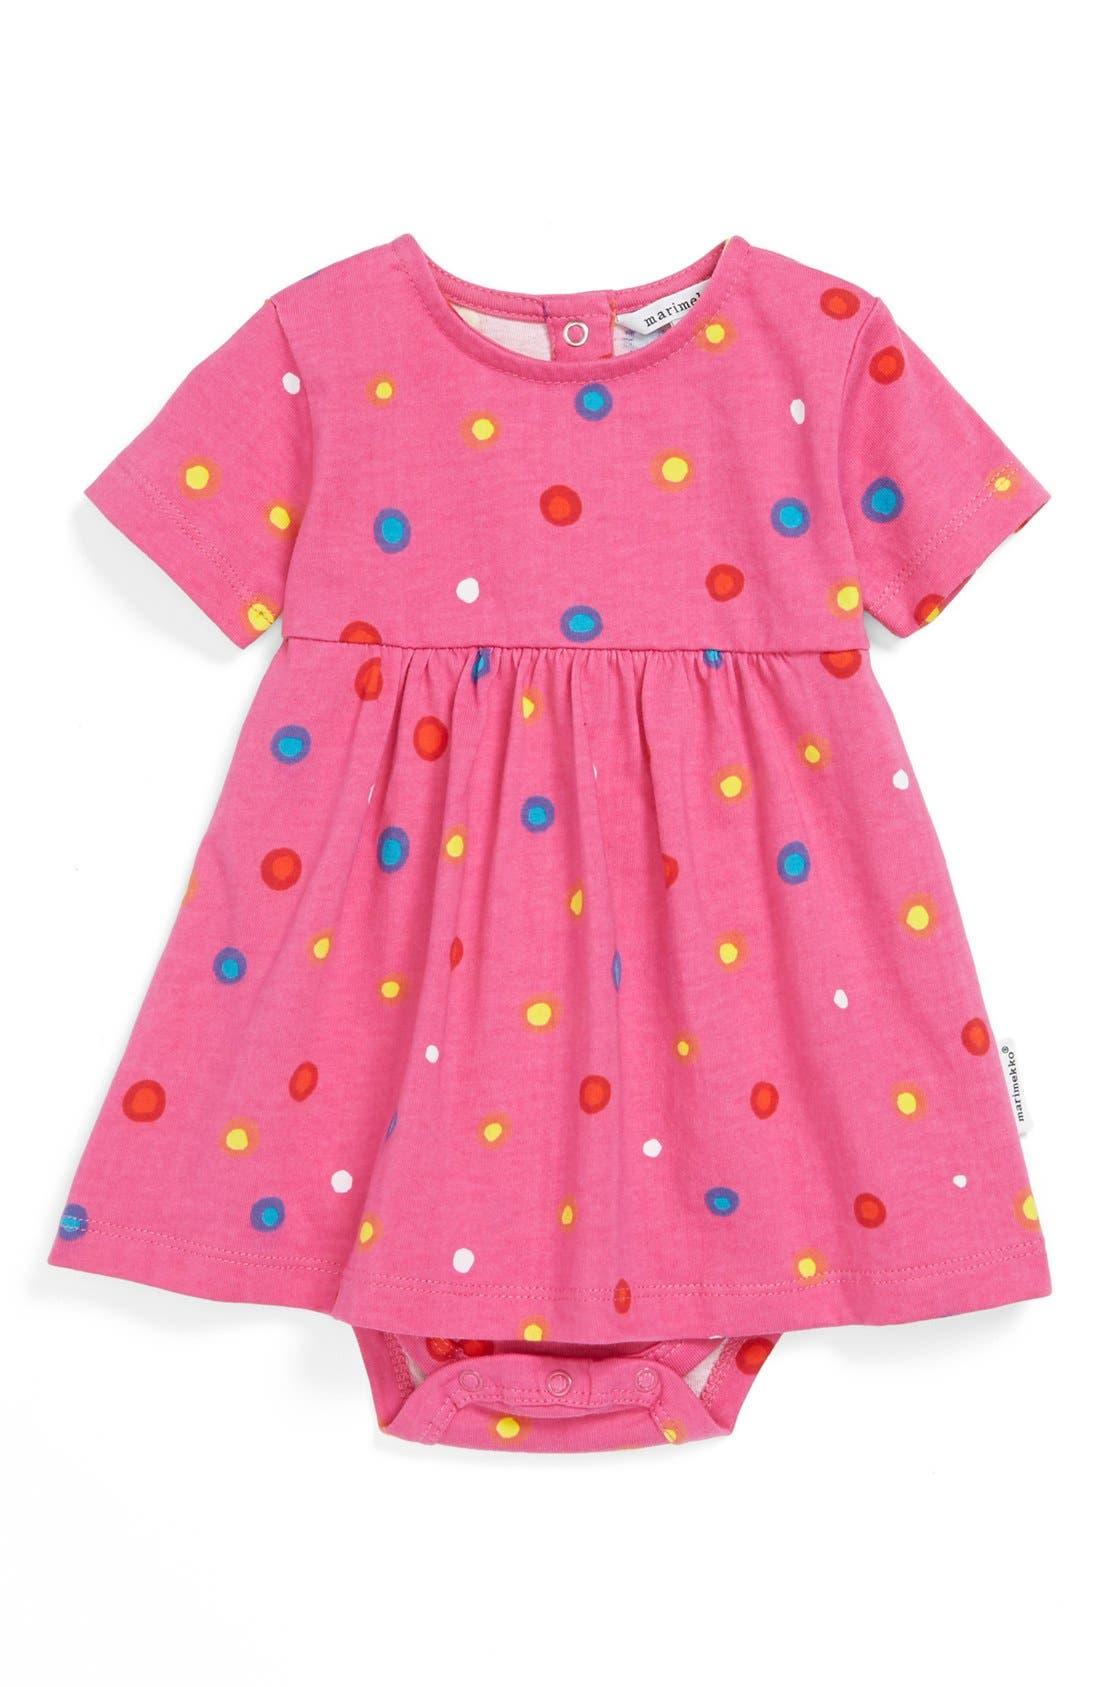 Alternate Image 1 Selected - Marimekko Polka Dot Bodysuit (Baby Girls)